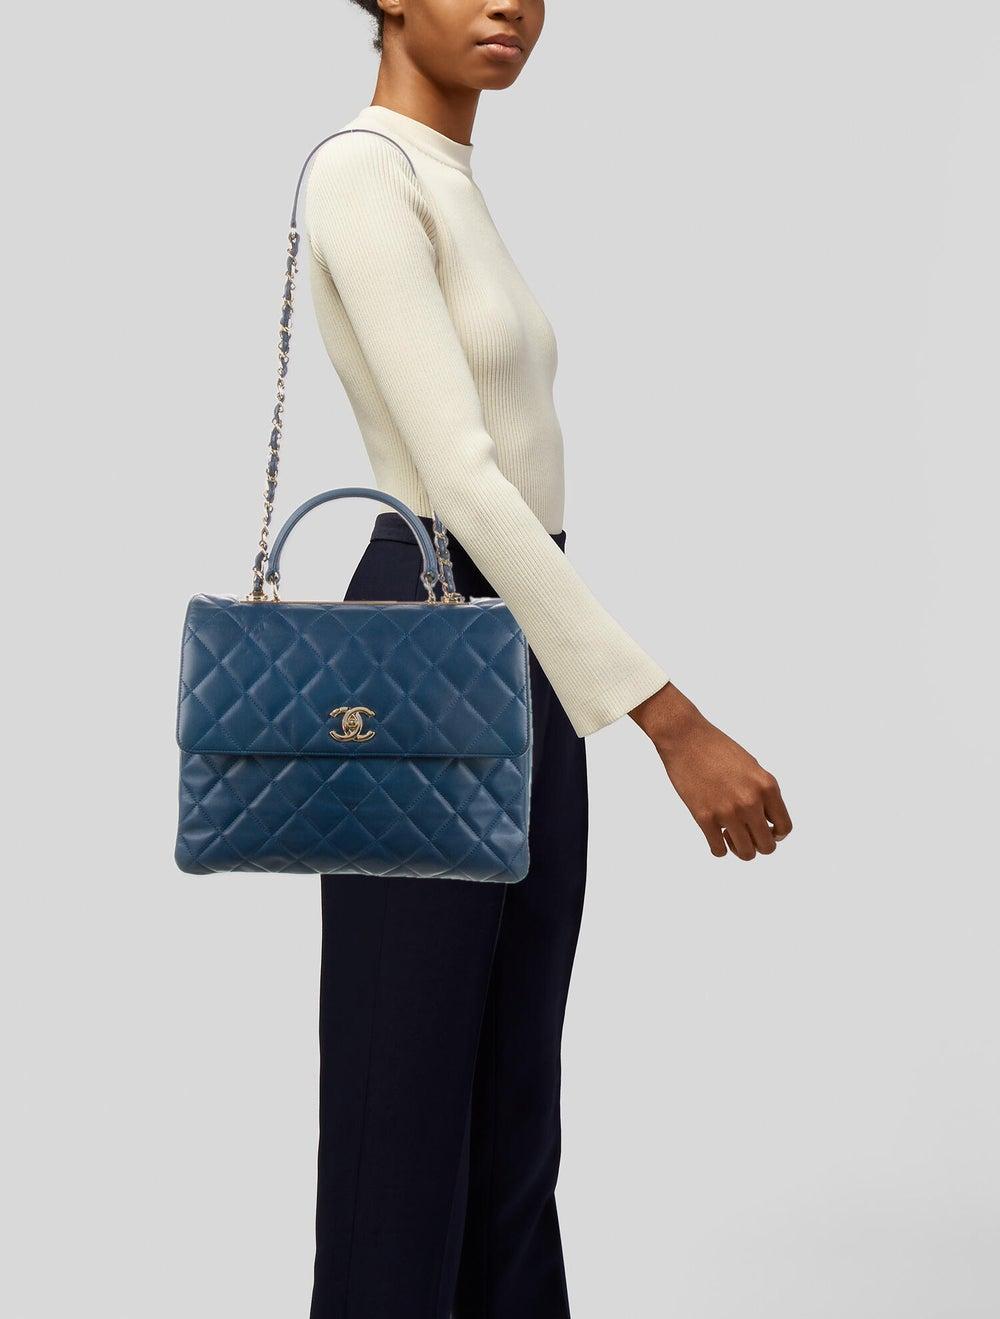 Chanel Large Trendy CC Flap Bag Blue - image 2